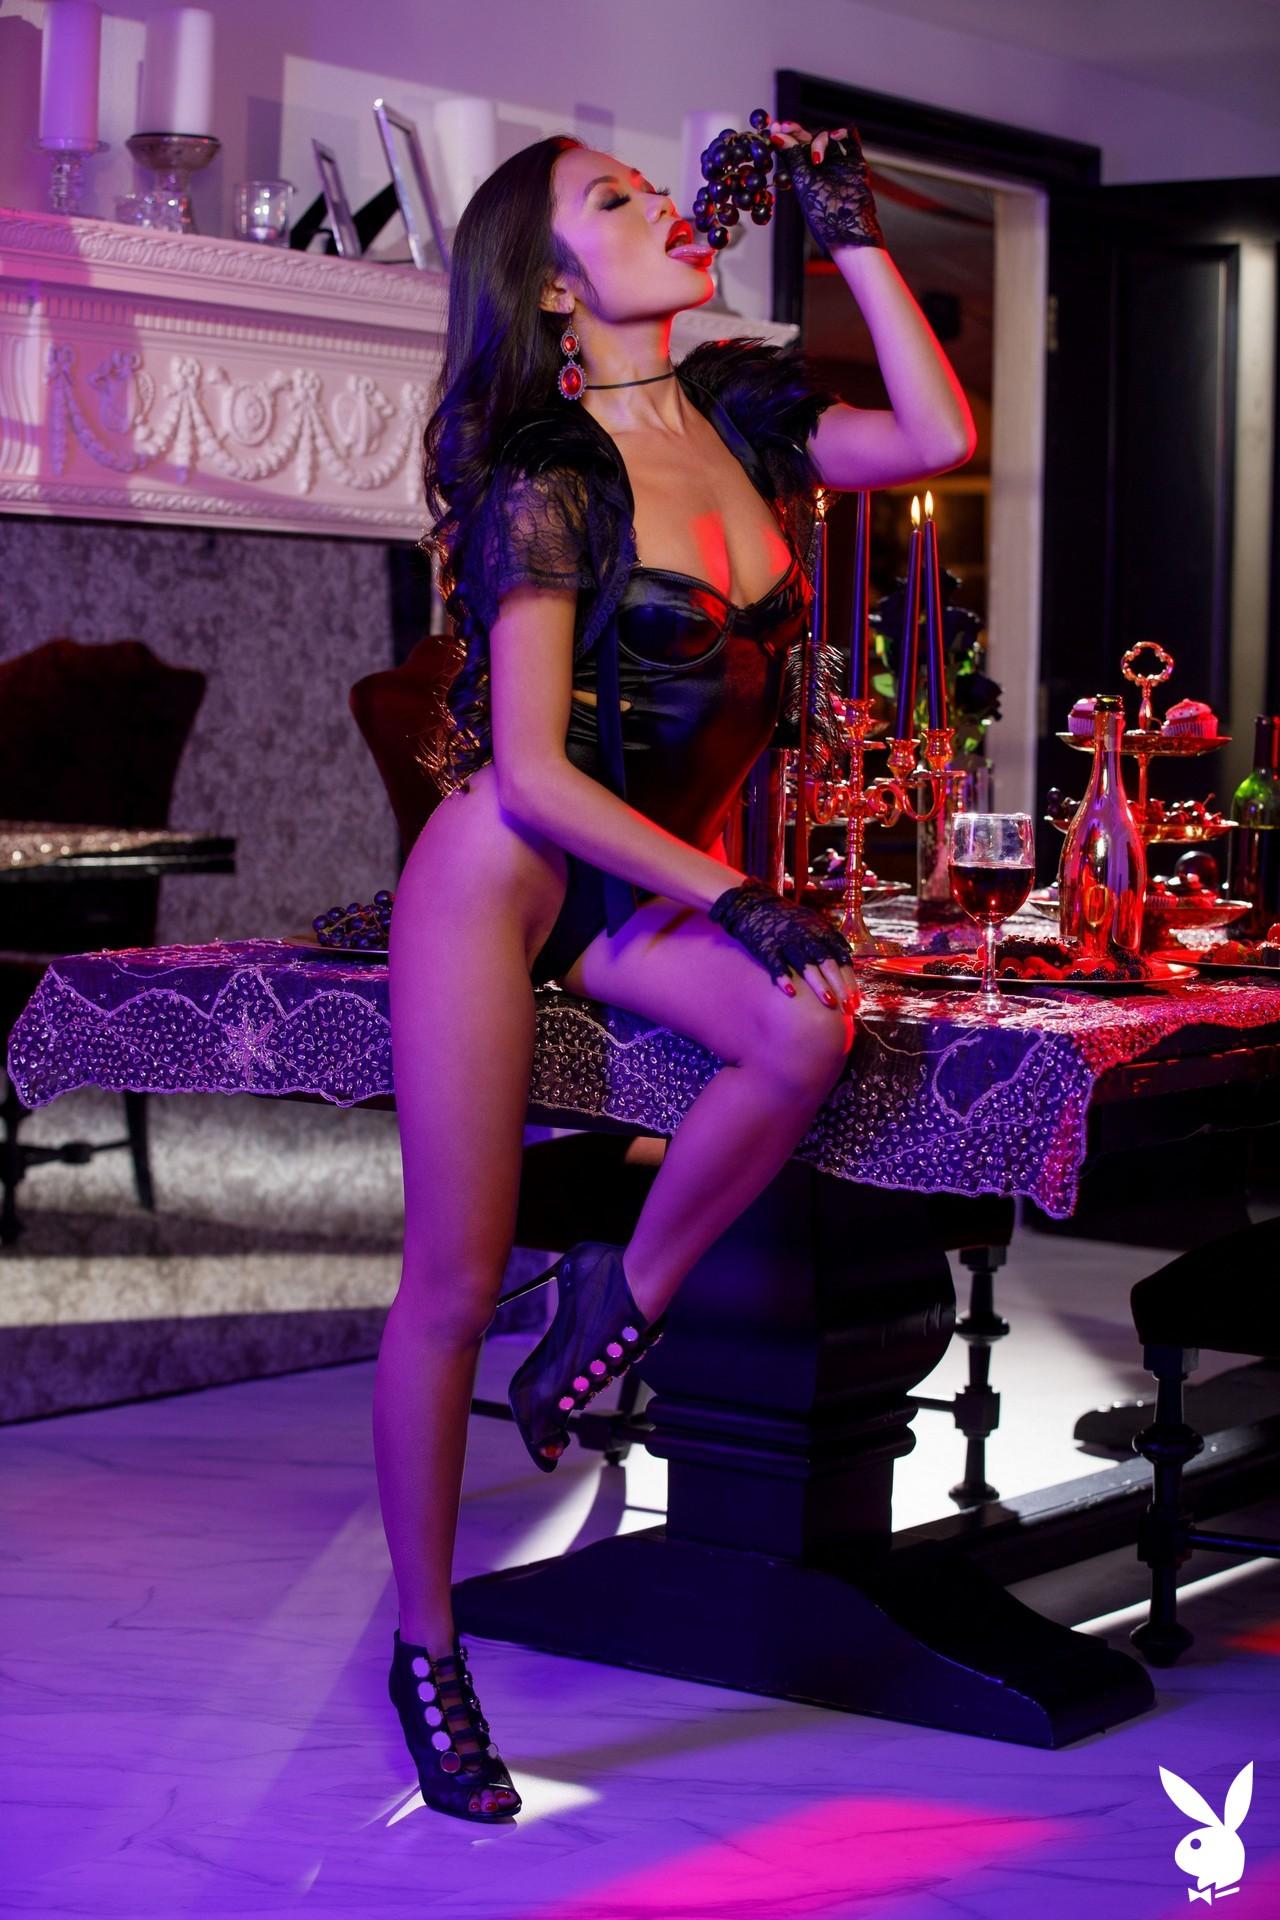 Vina Sky In Midnight Indulgence Playboy Plus (6)